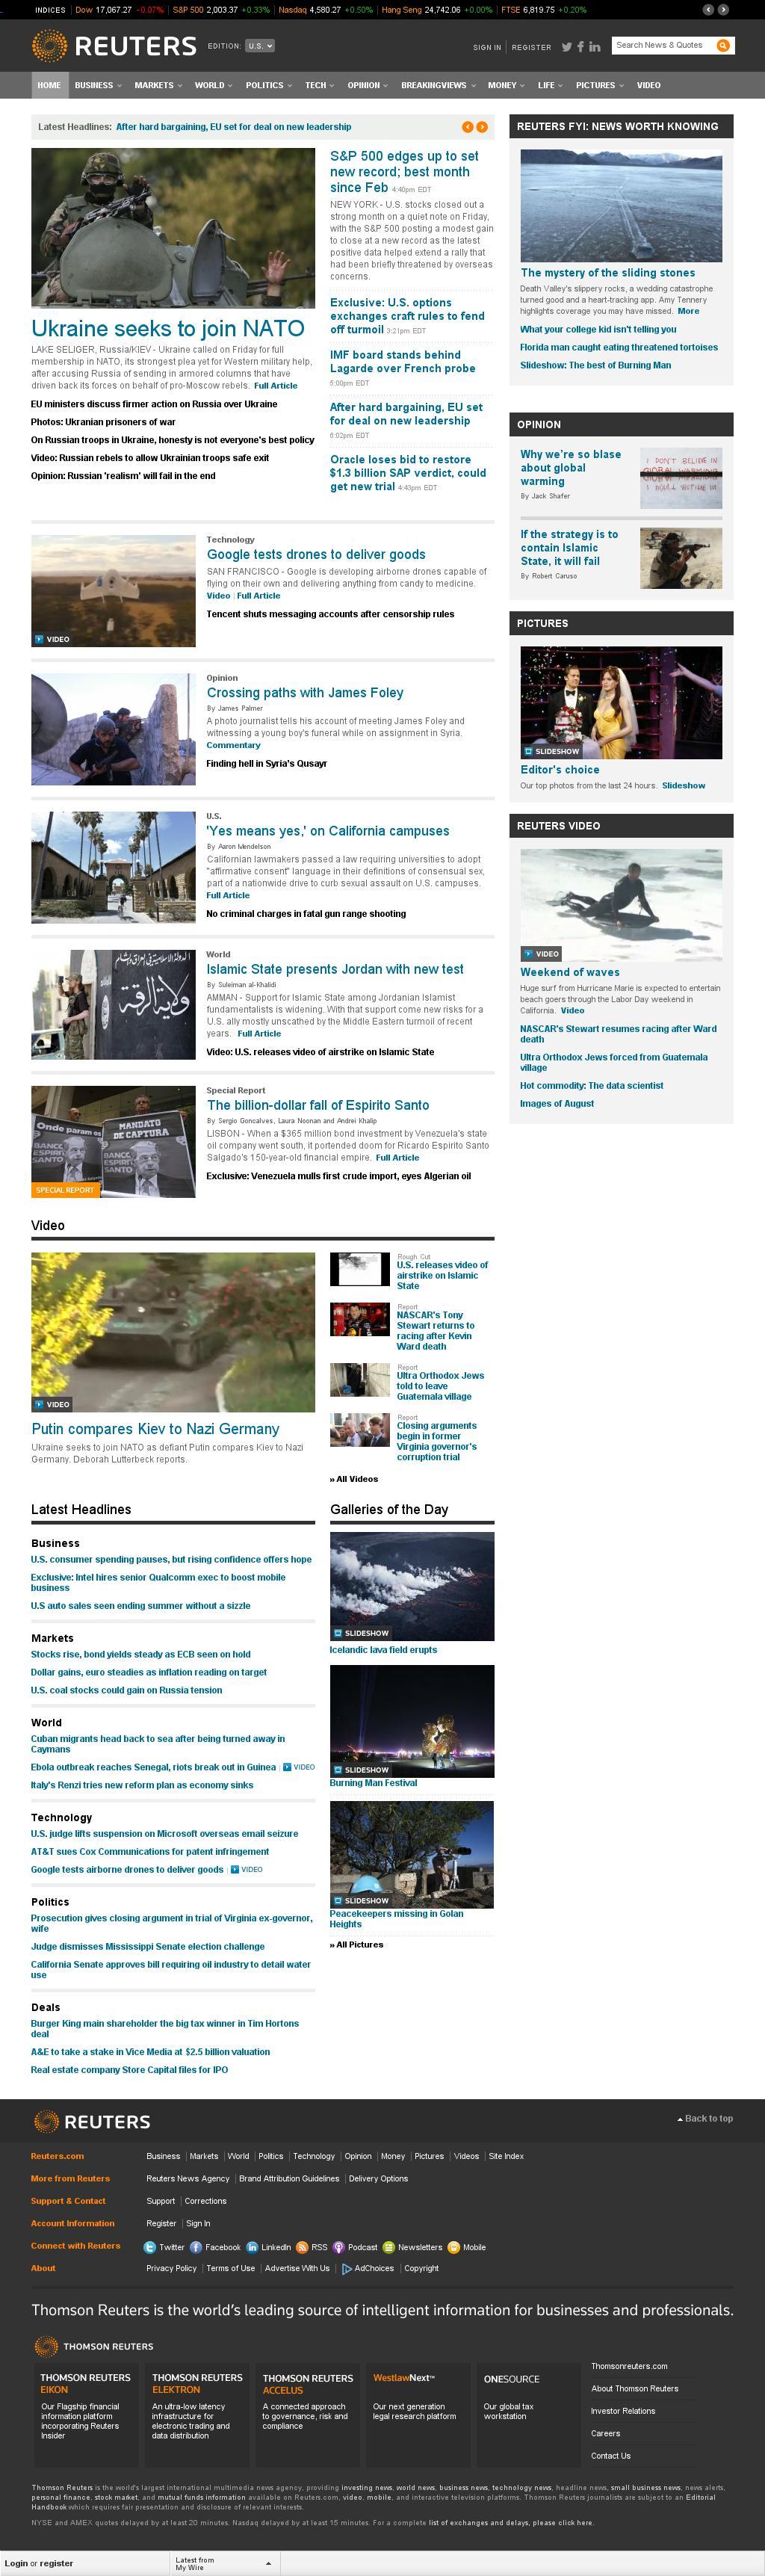 Reuters at Friday Aug. 29, 2014, 10:14 p.m. UTC